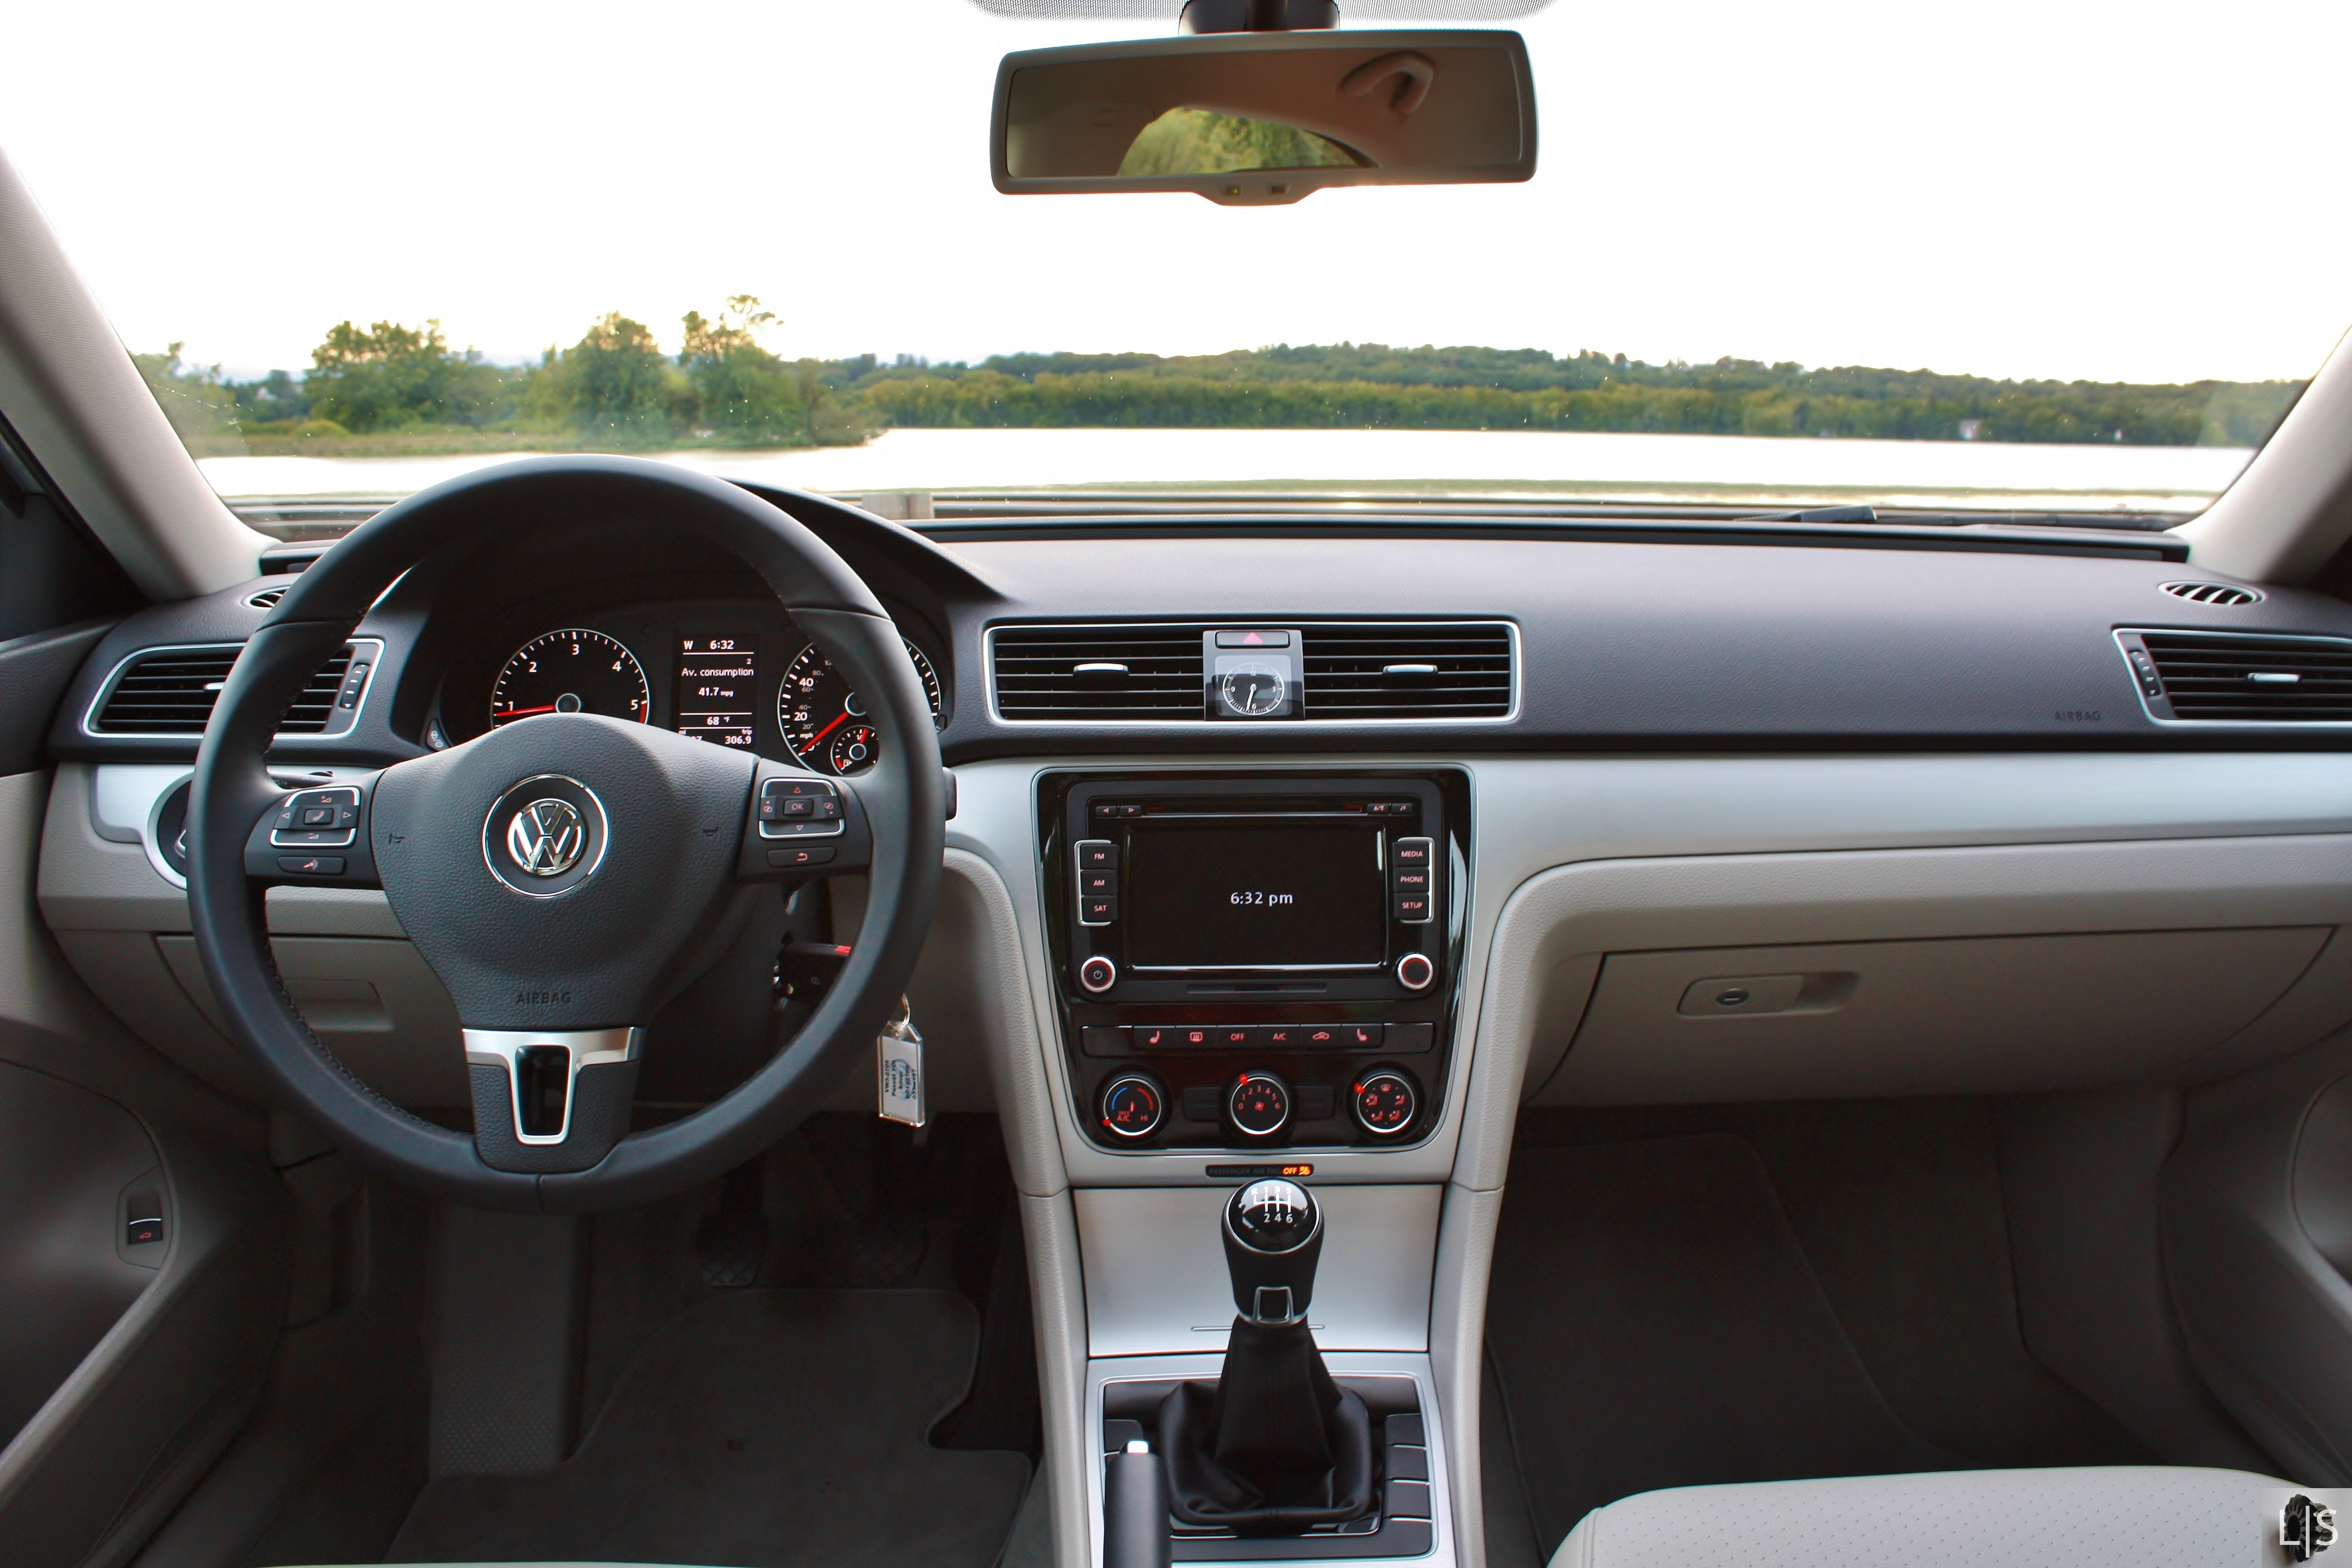 beetle money tdi volkswagen will jetta cars engine offer copy diesel new passat story golf